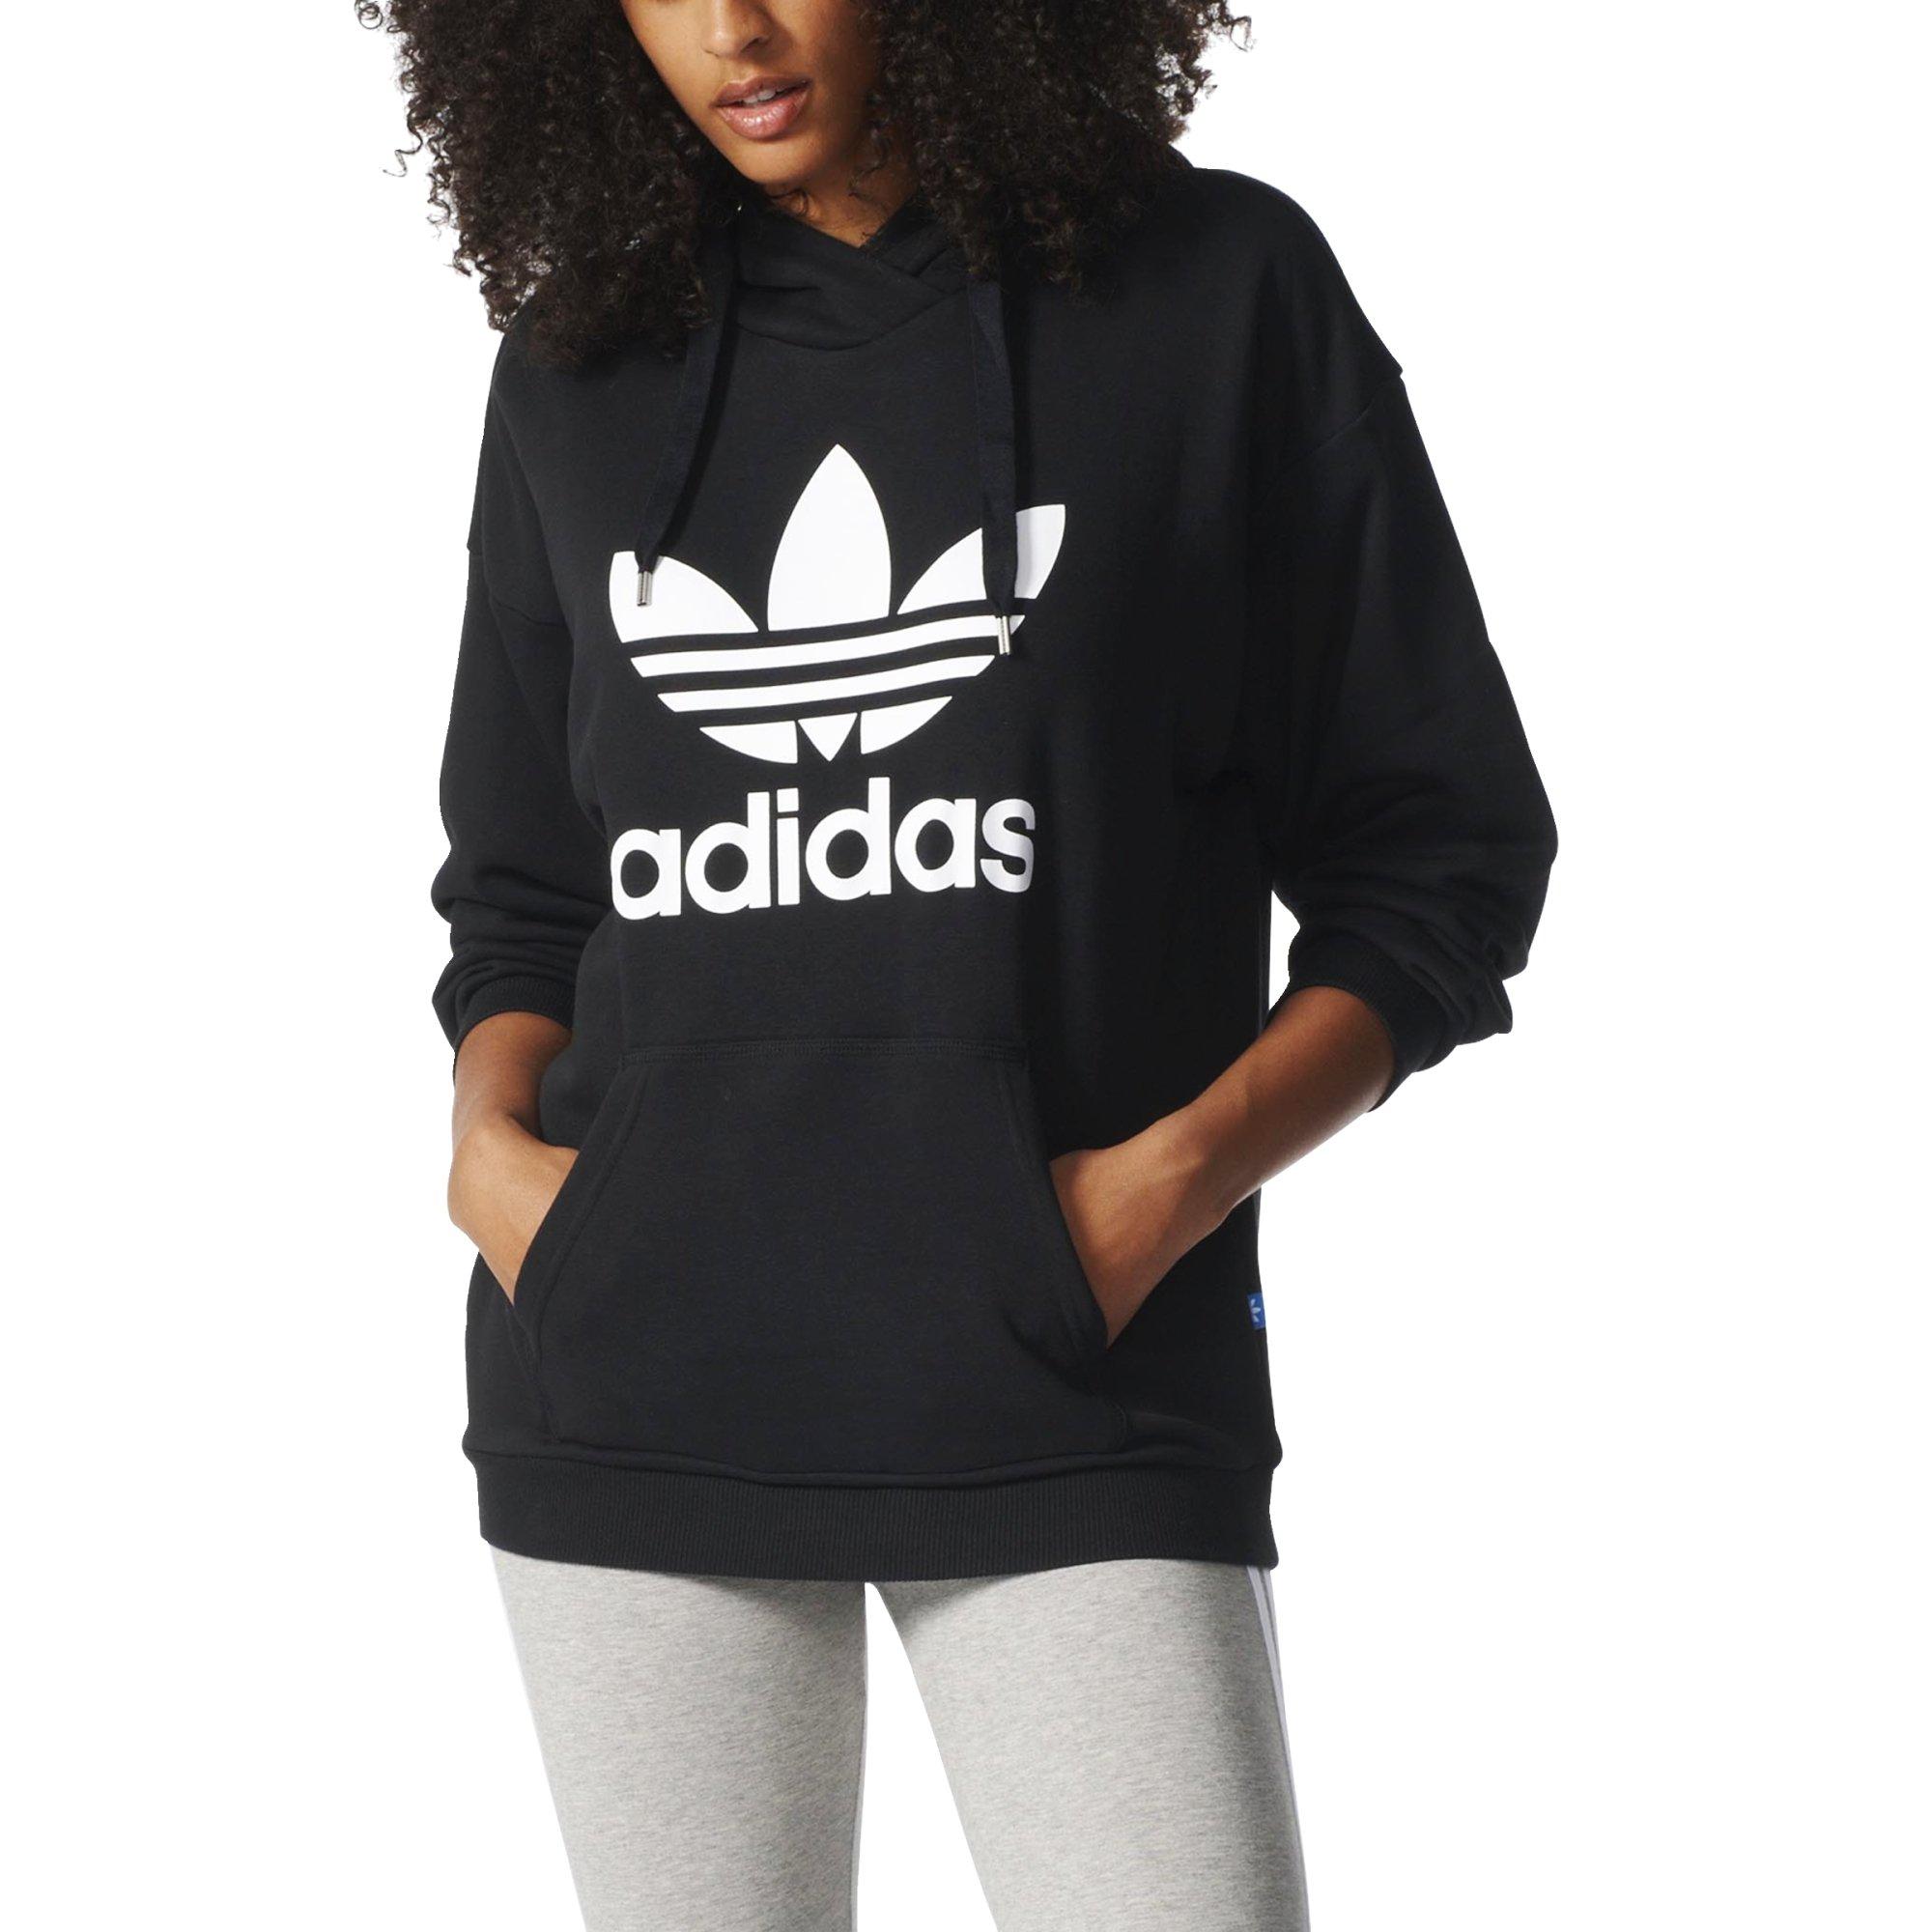 adidas Originals Women's Trefoil Hoodie, Black/White, XS